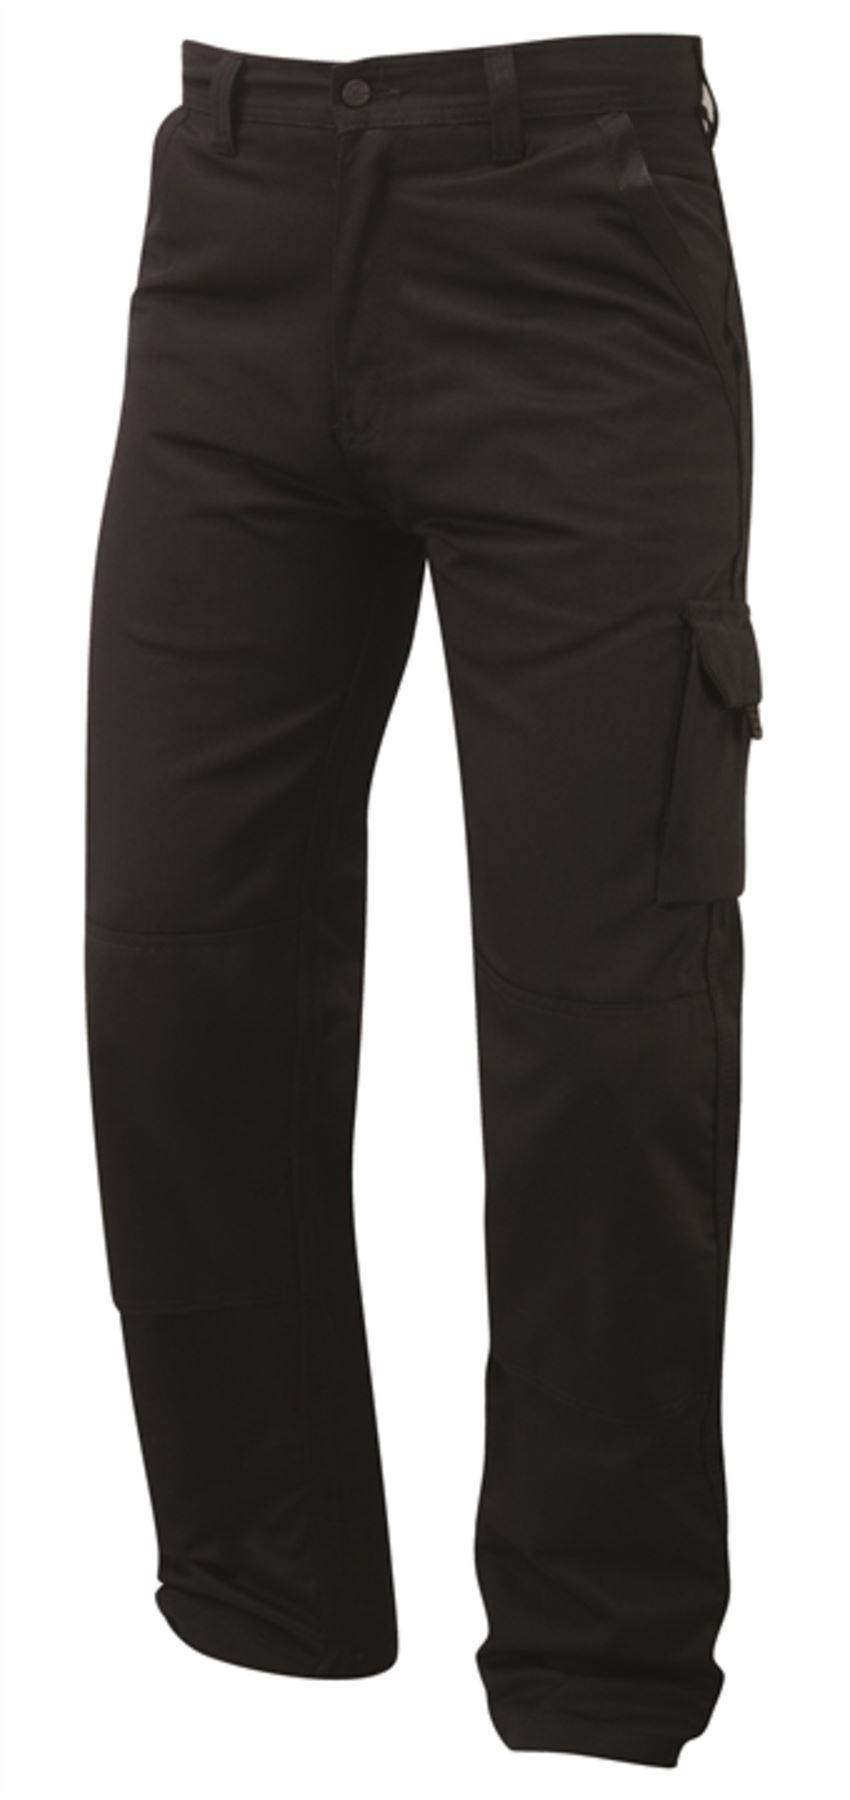 Orn Heron Kneepad Combat Trousers - Black|48W29L